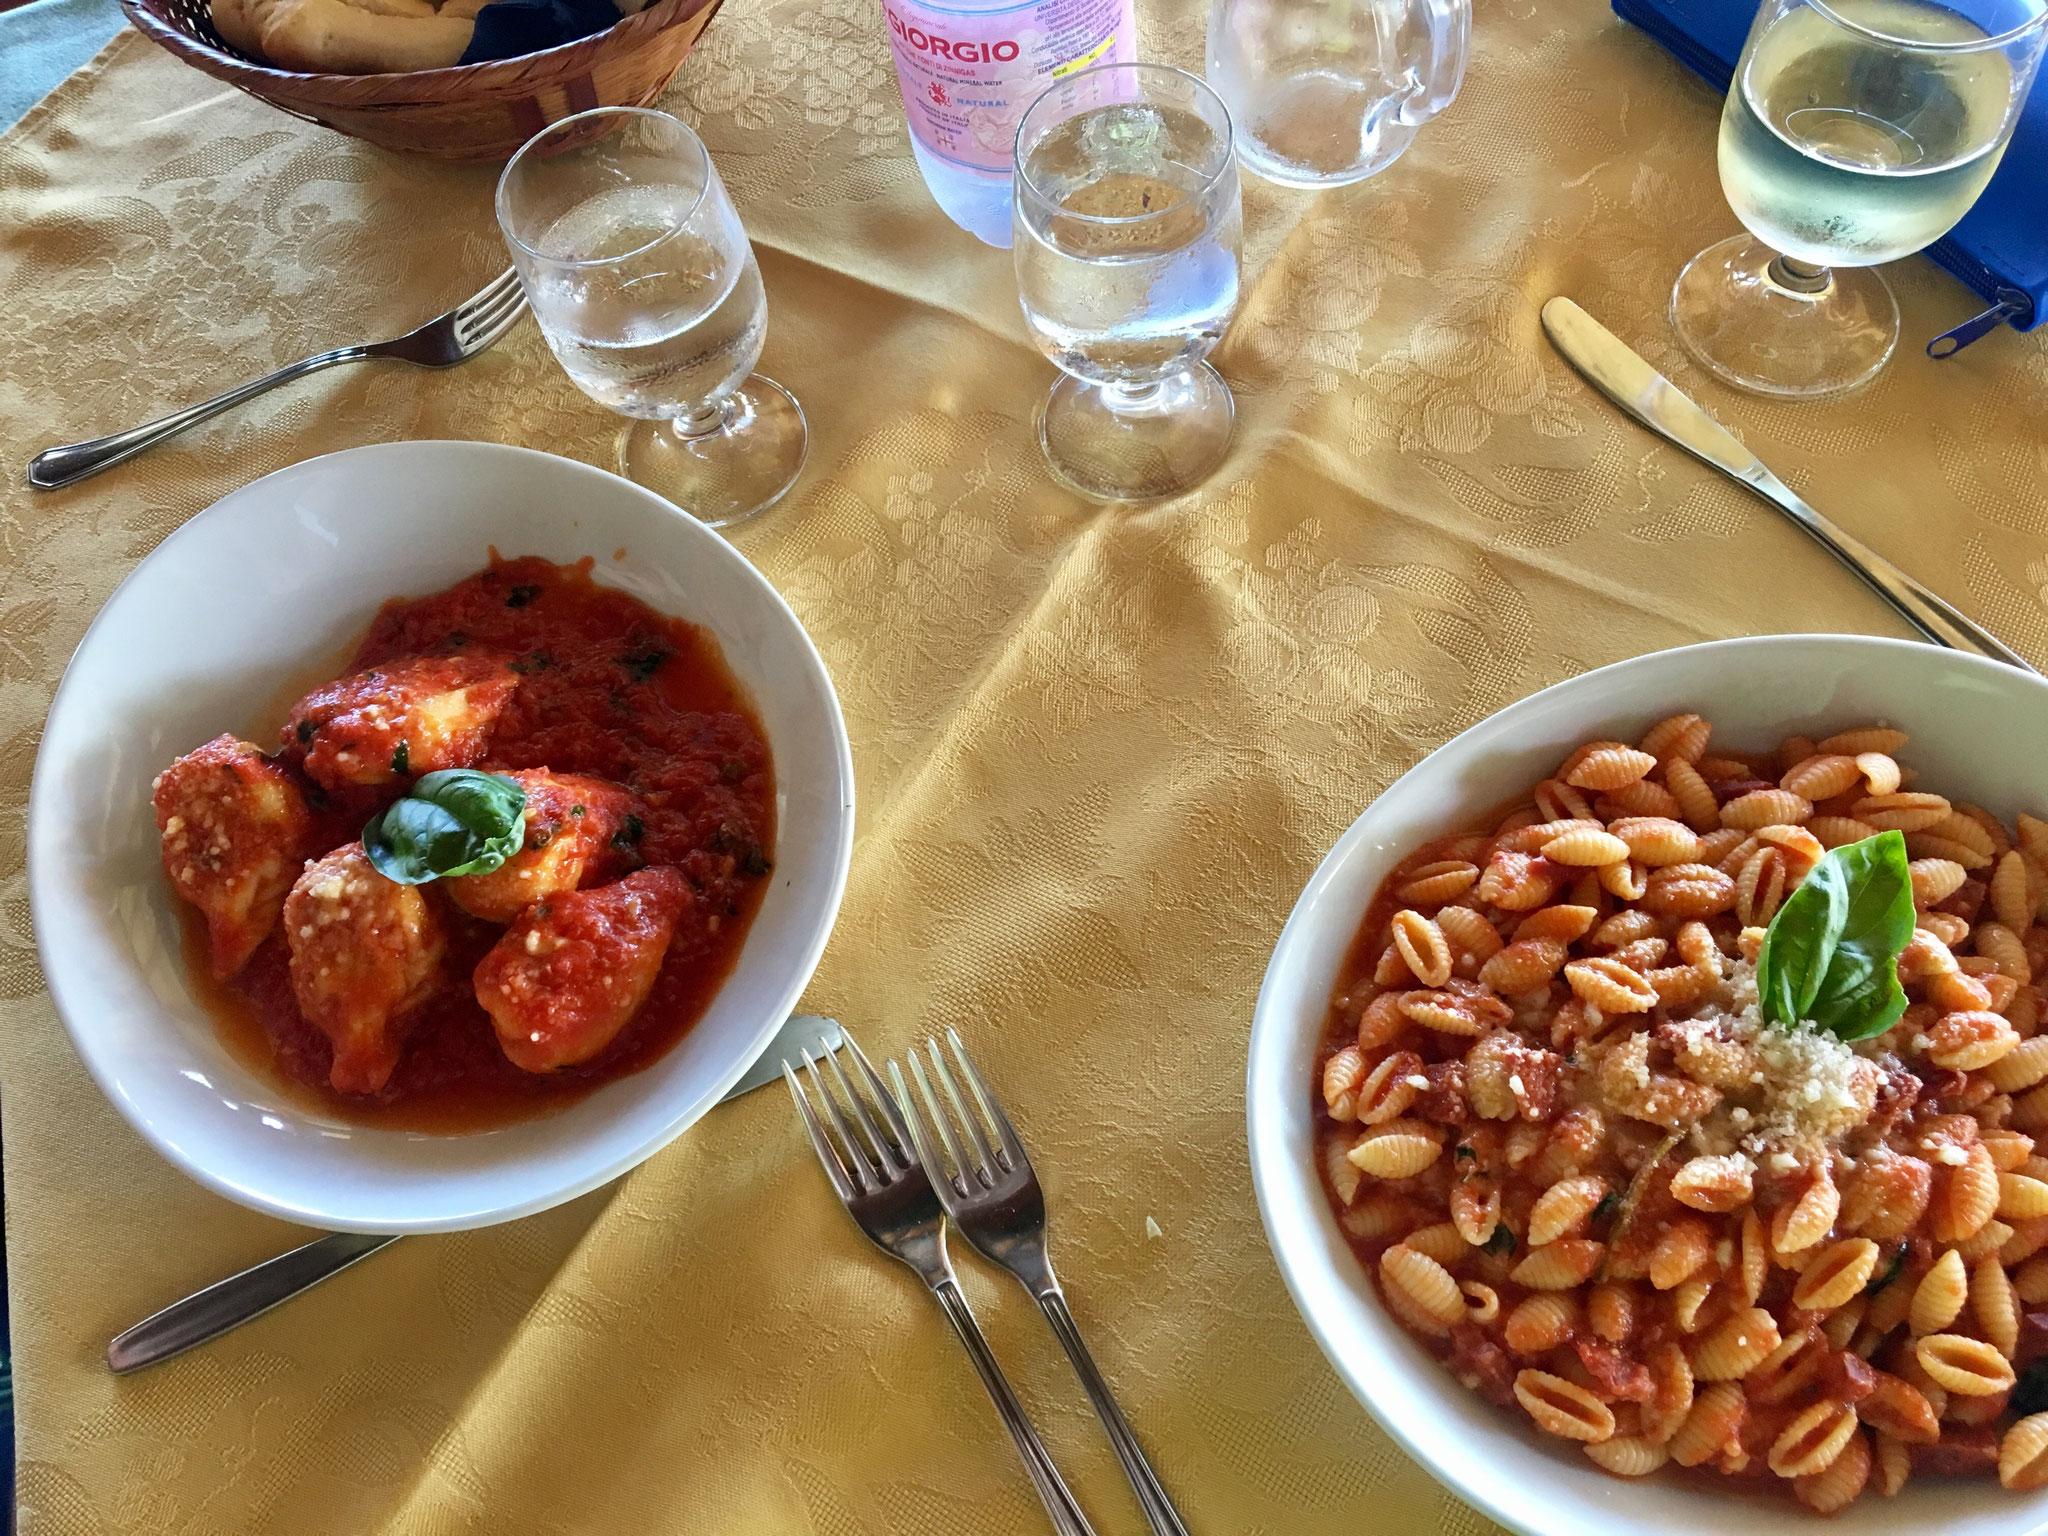 Lunch at the hotel La Vela